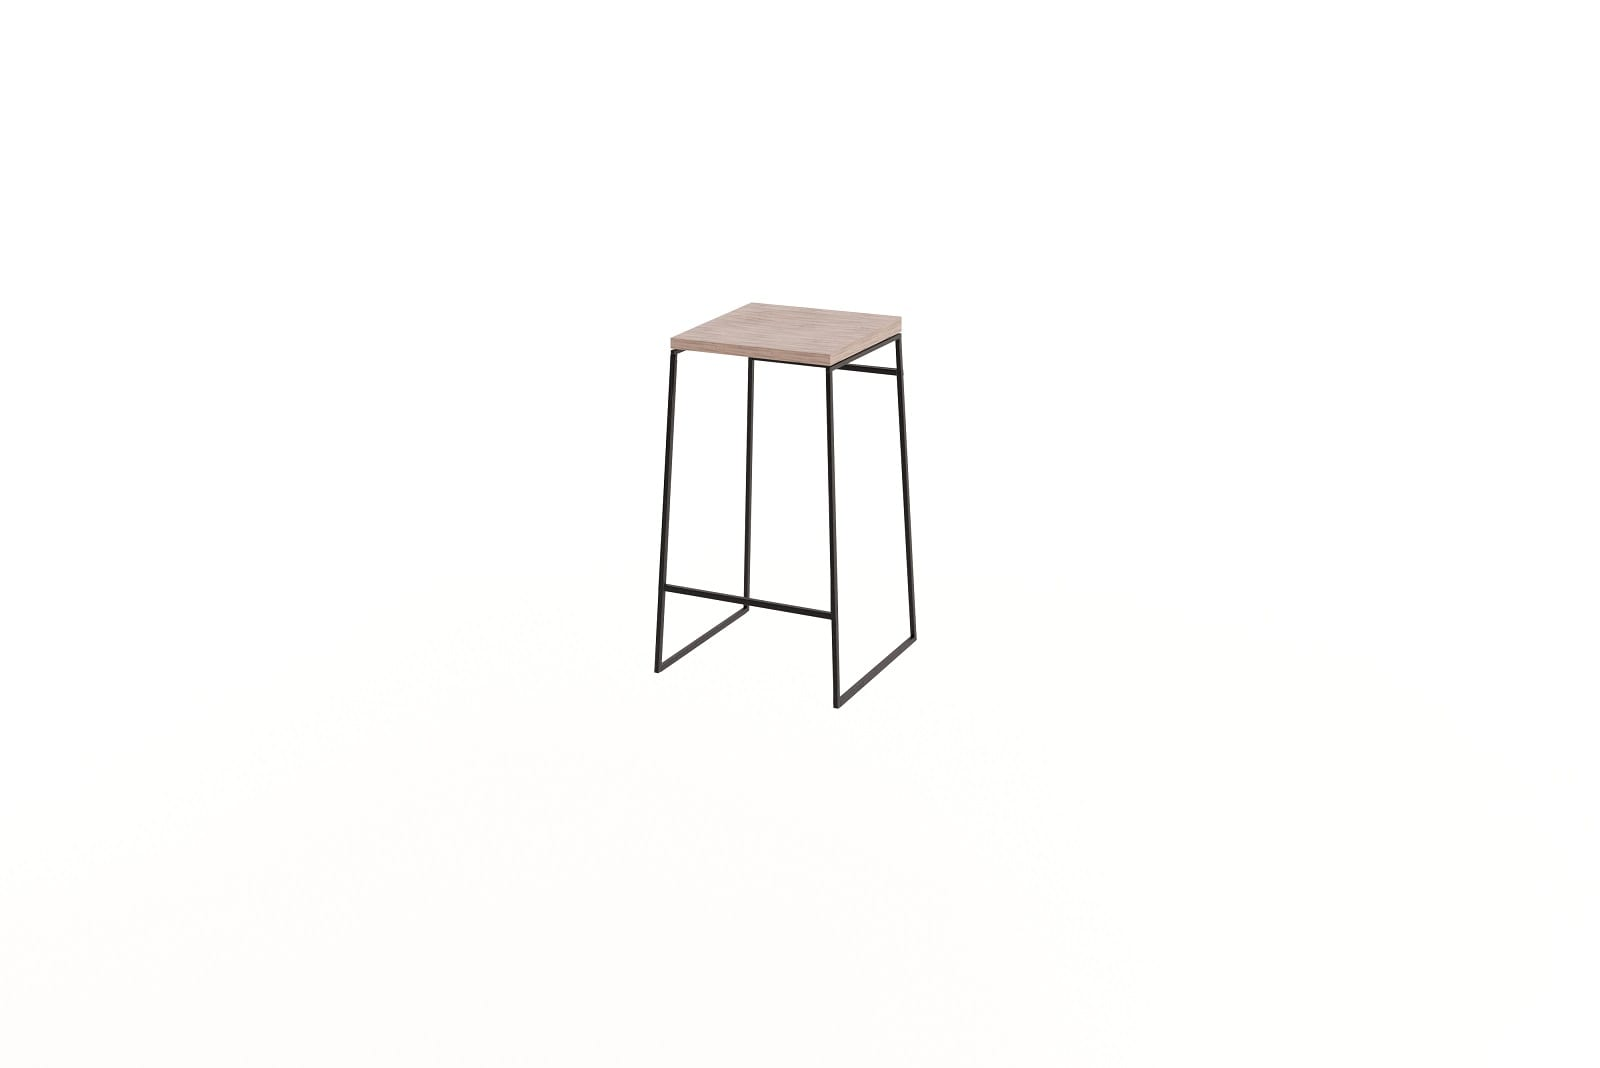 Steel Frame Bar Stool South Africa Steel Furniture For Sale